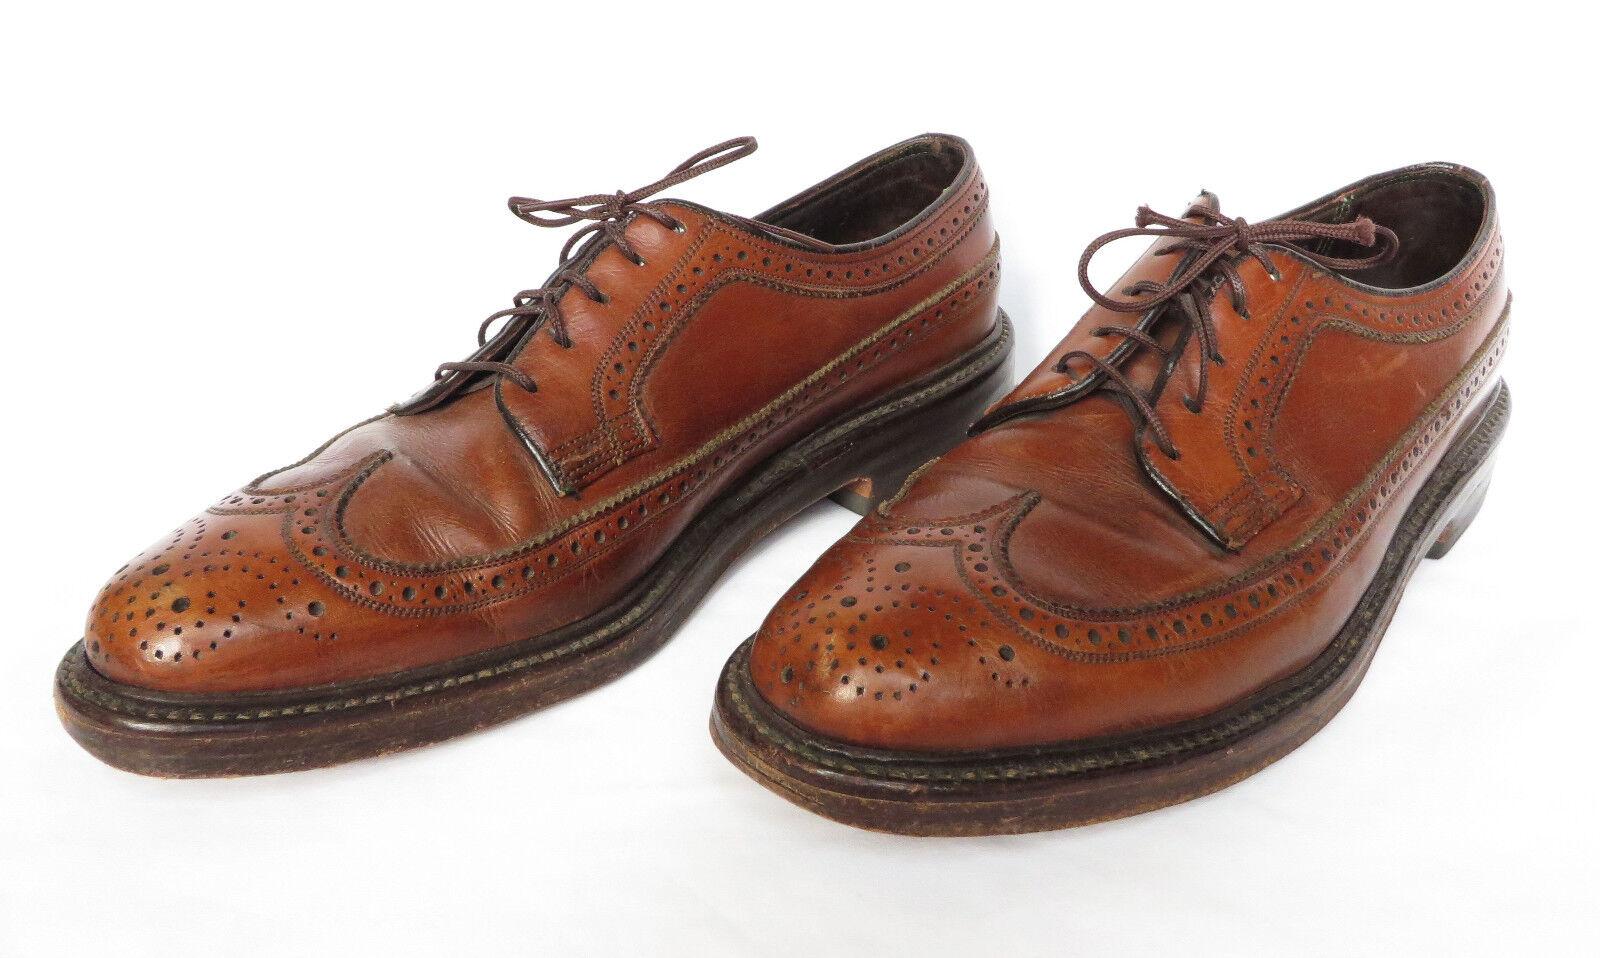 Florsheim Imperial Kenmoor 93602 Homme Marron Bout D'Aile Derbies Chaussures 8 C